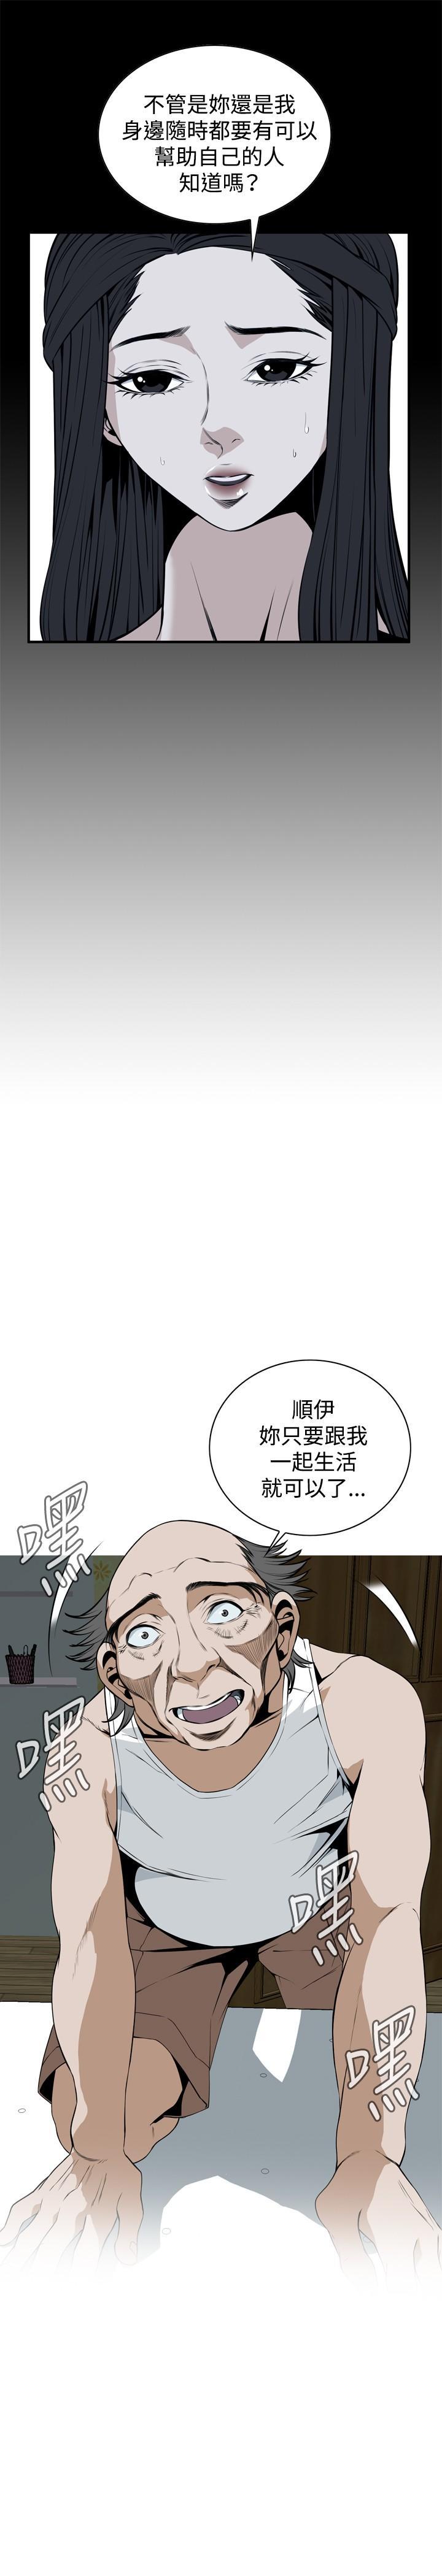 Take a Peek 偷窥 Ch.39~55 [Chinese]中文 7